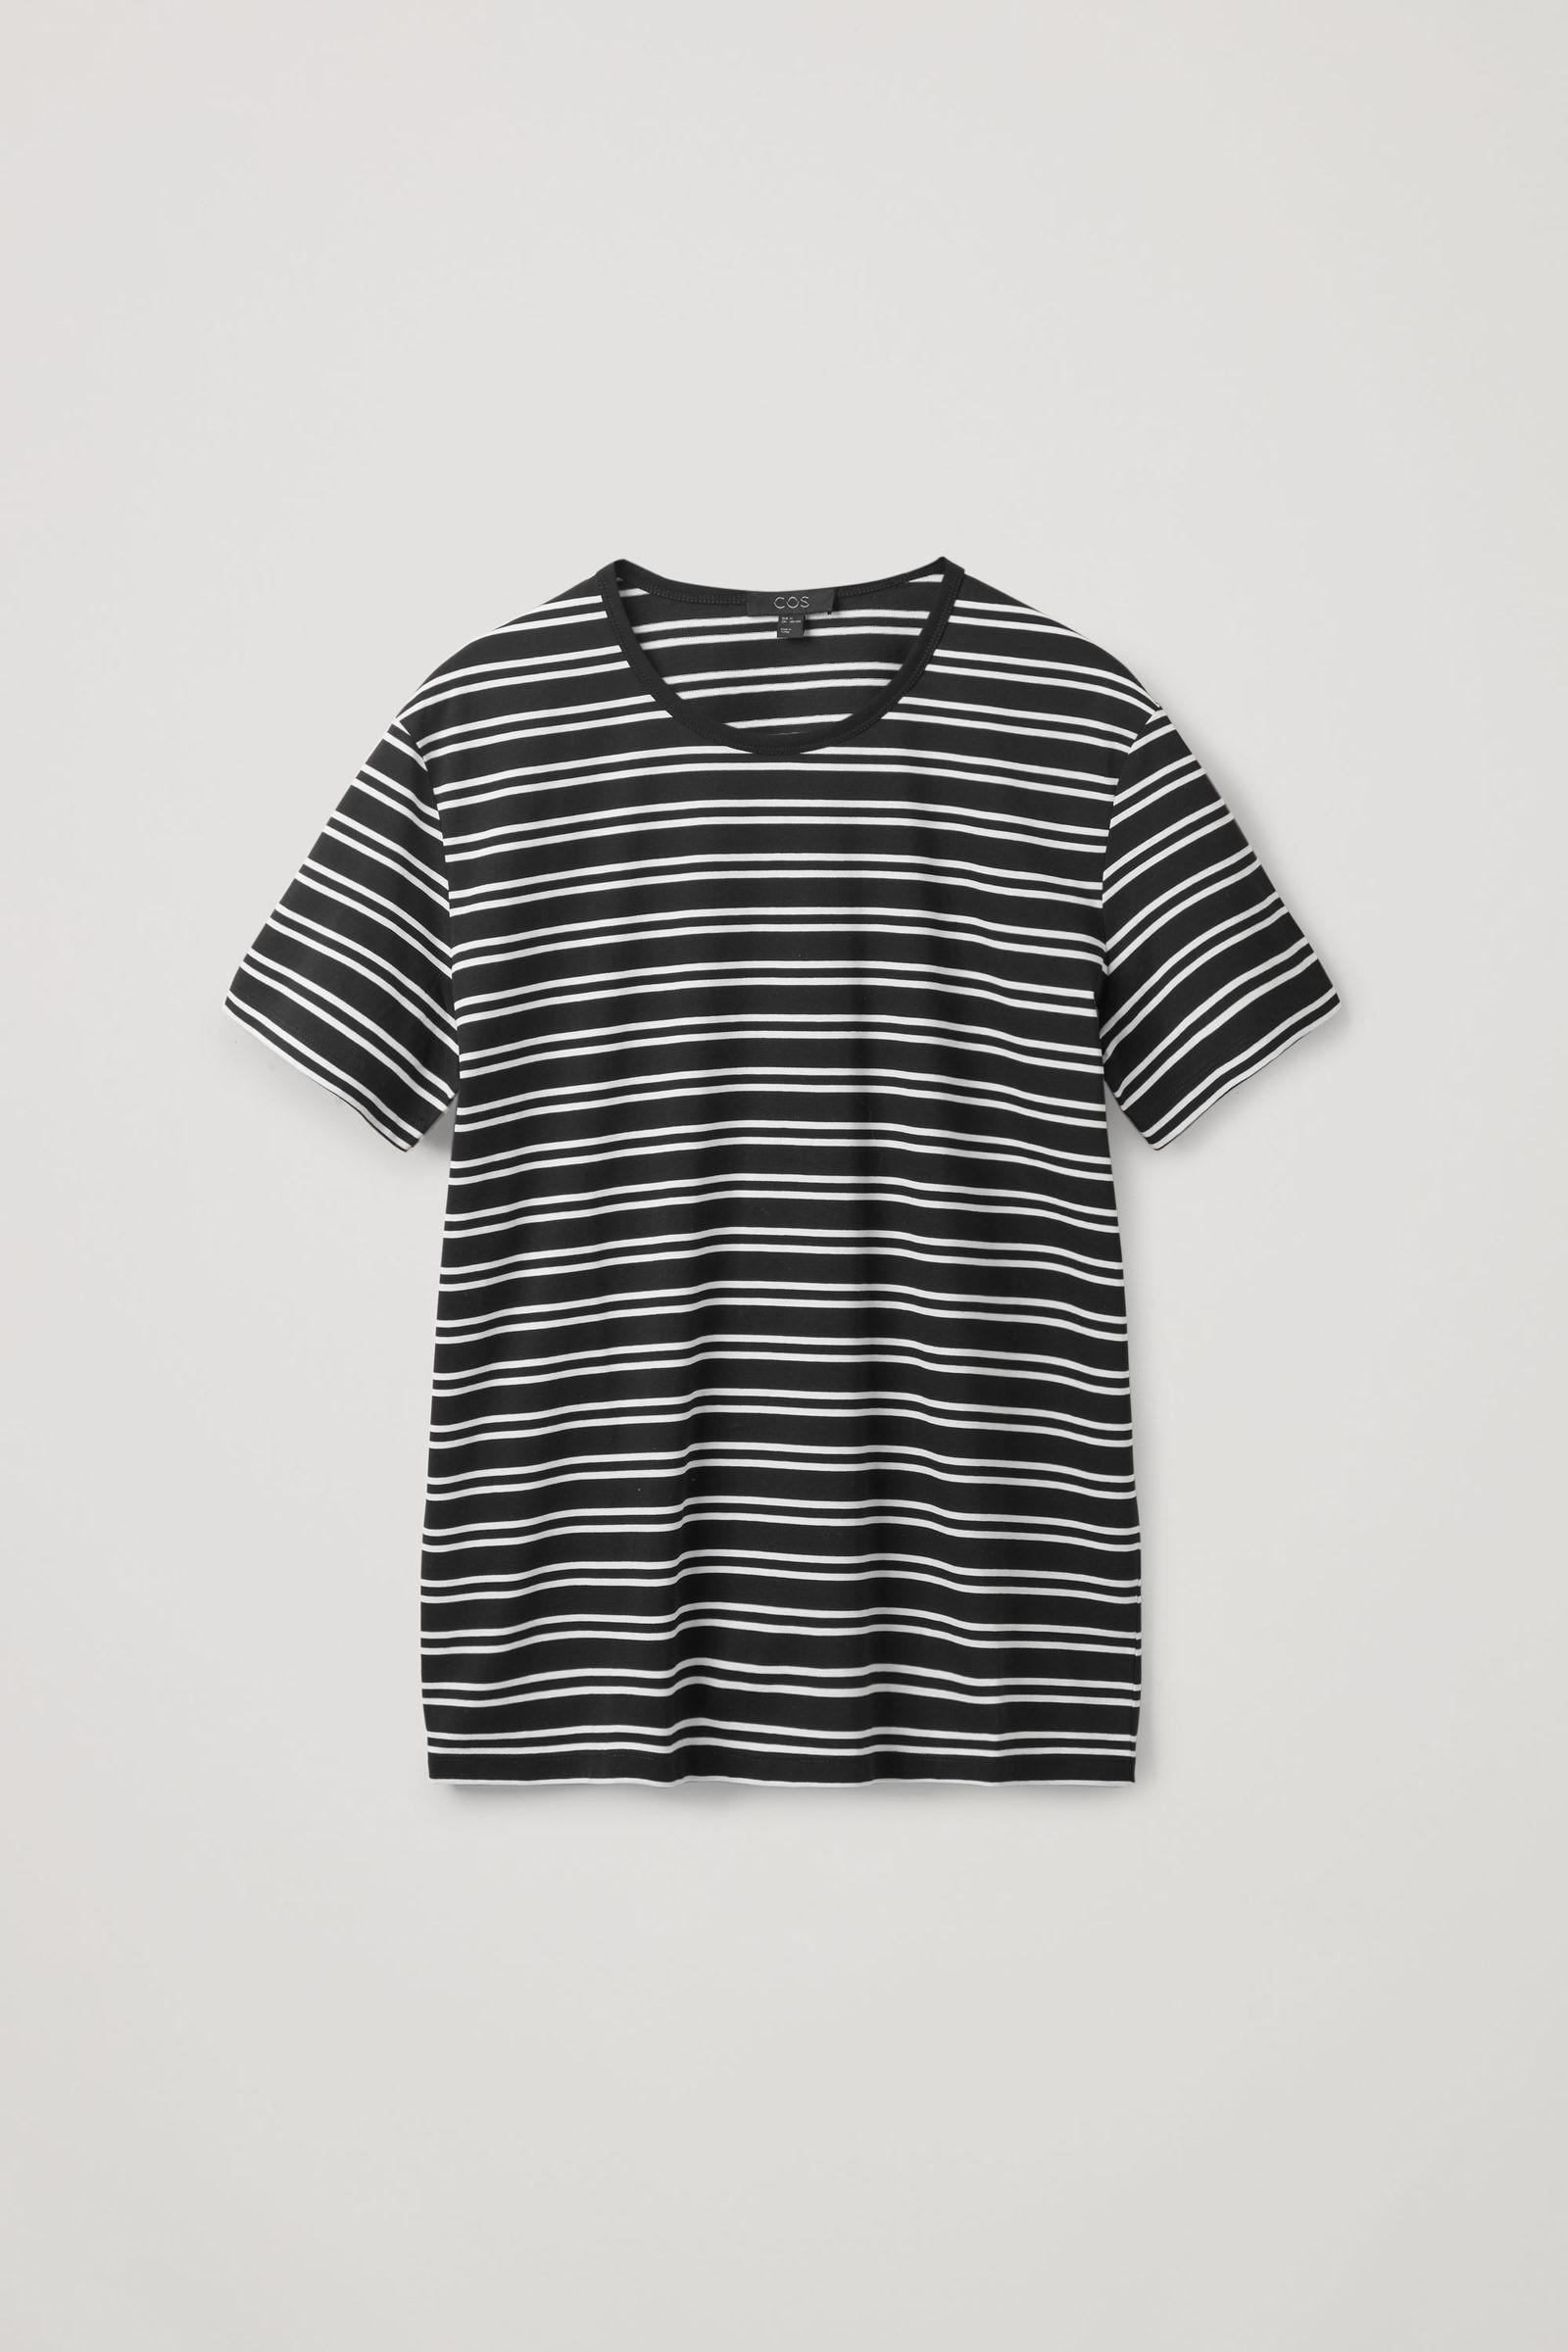 COS 레귤러 핏 티셔츠의 블랙 / 화이트컬러 Product입니다.